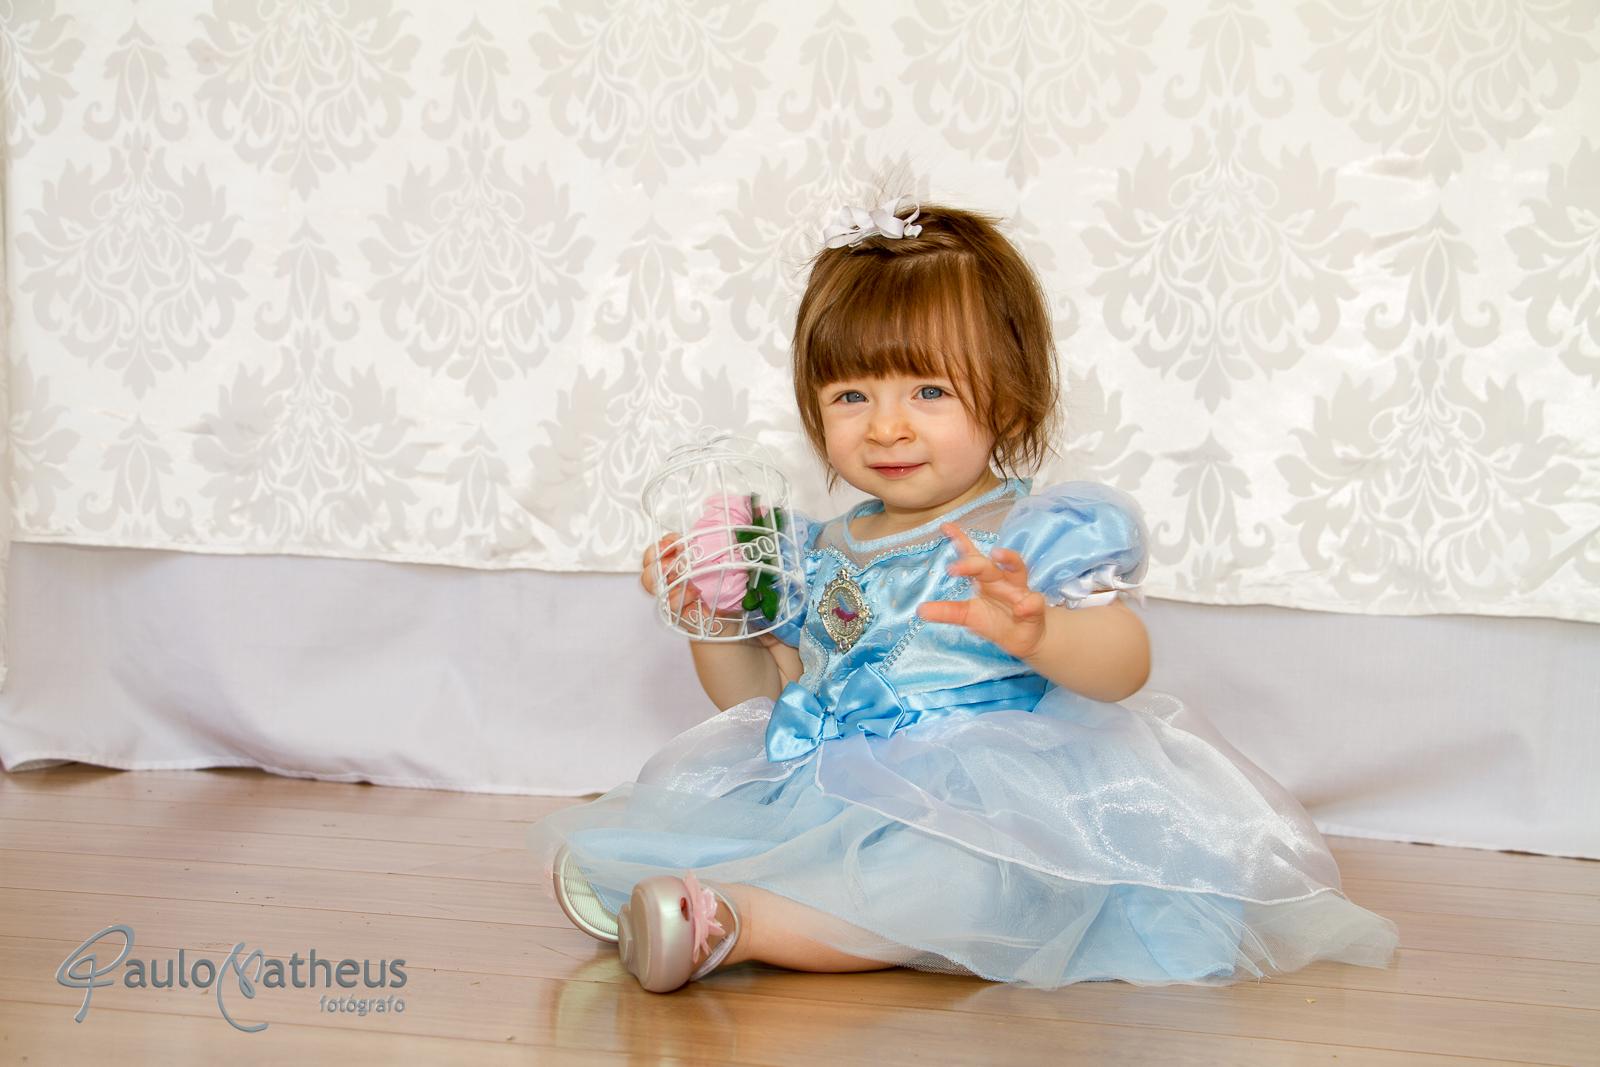 fotografia infantil por Paulo Matheus